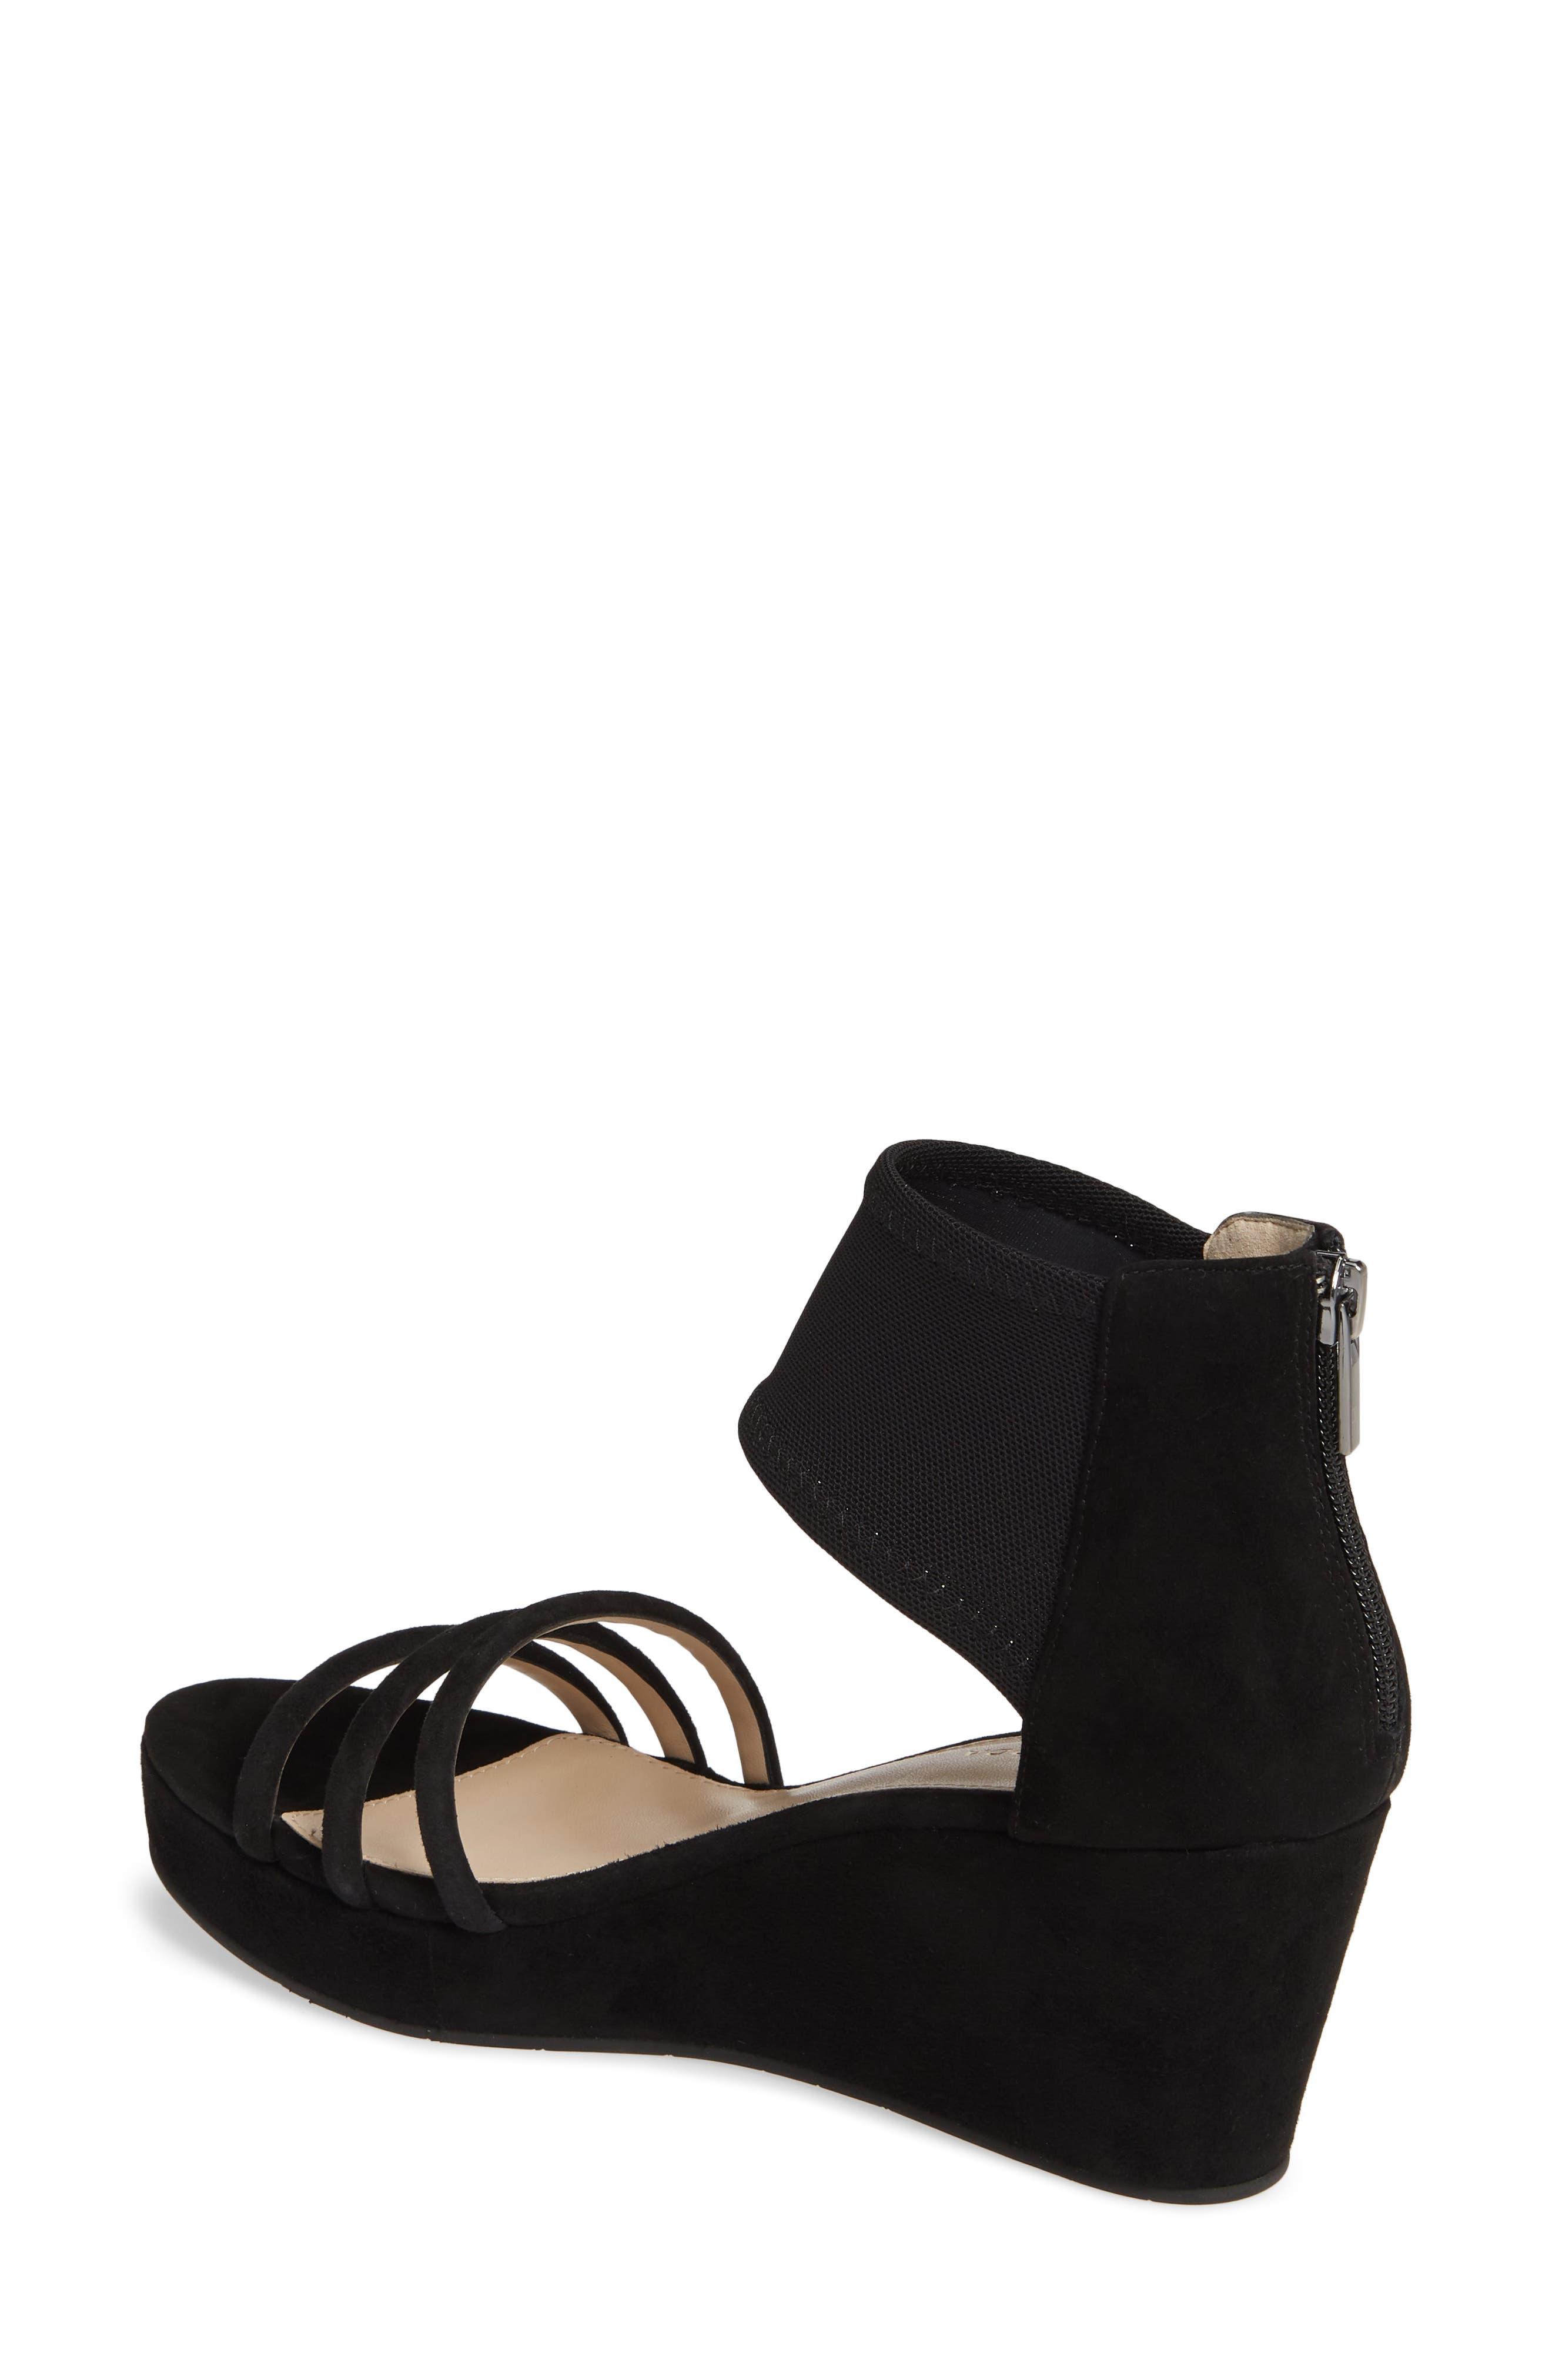 PELLE MODA, Katrice Platform Wedge Sandal, Alternate thumbnail 2, color, BLACK SUEDE